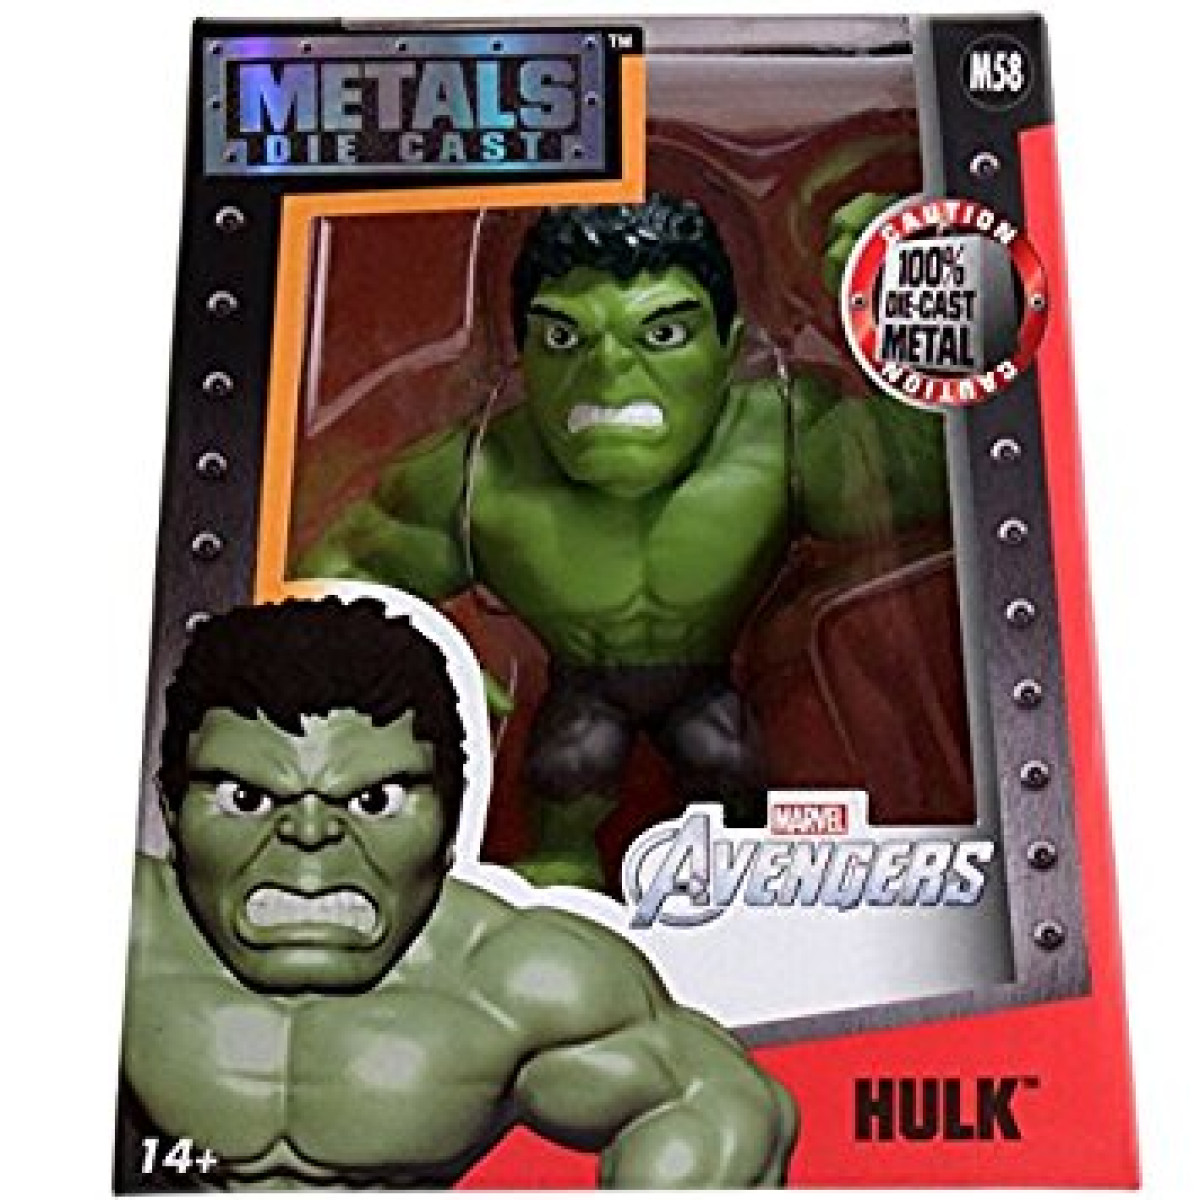 Hulk Metals Marvel 4 inch Classic Figure M58